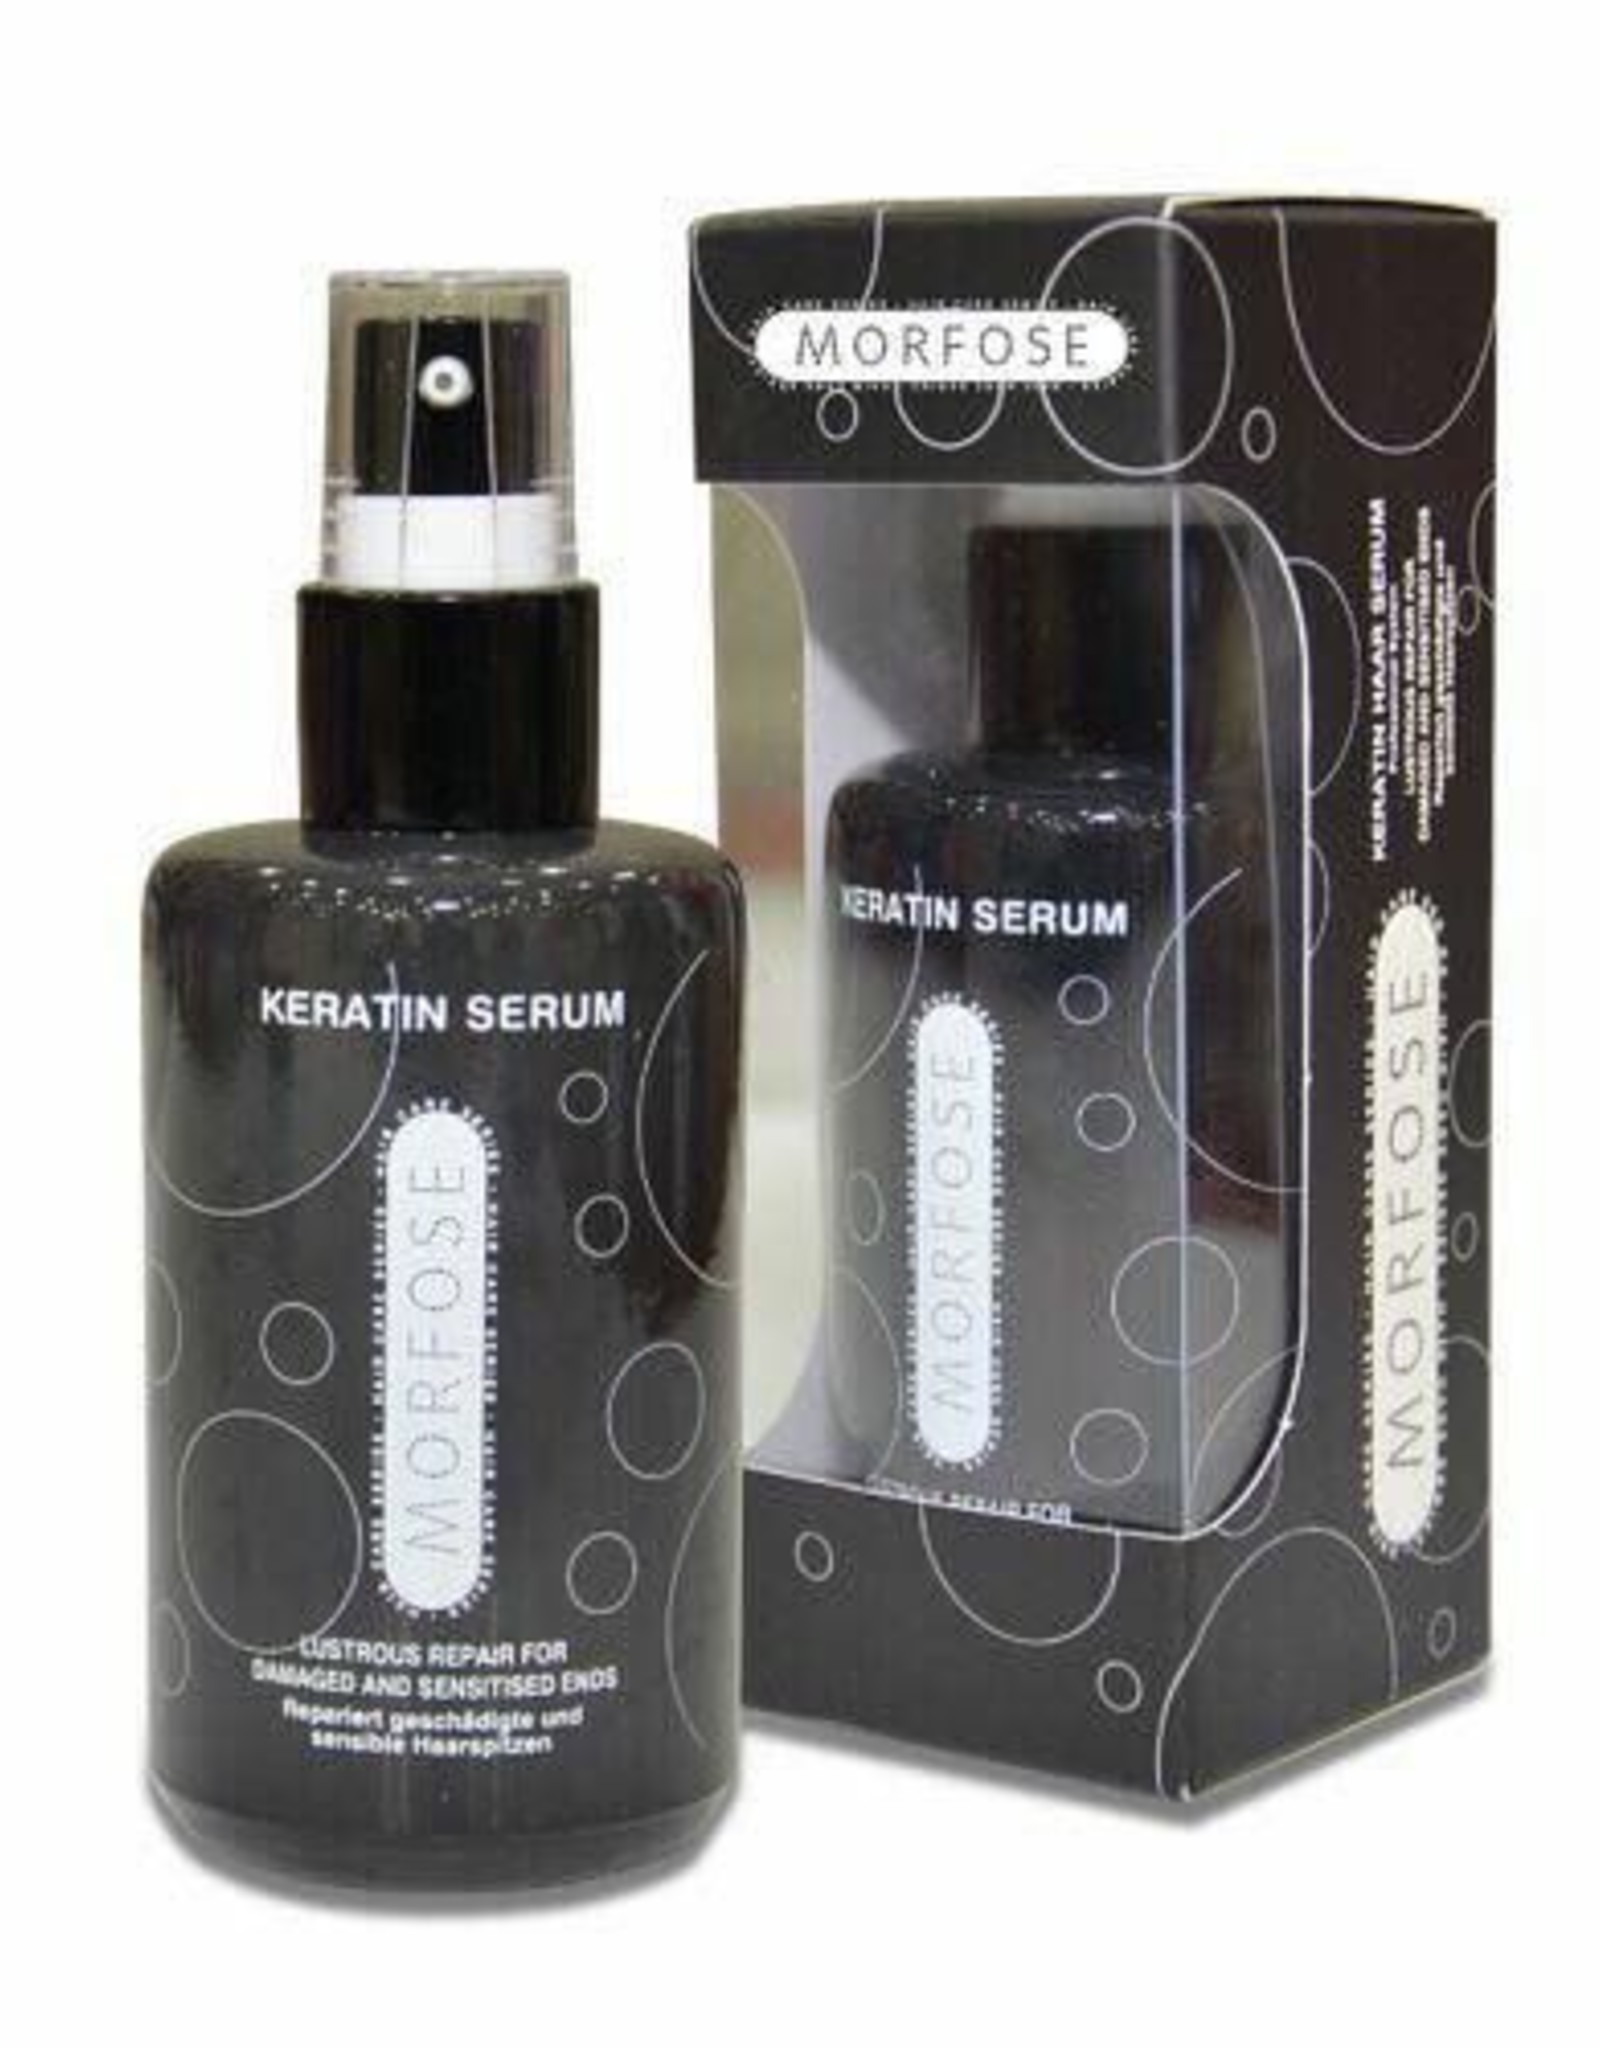 Morfose Hair Serum Keratin